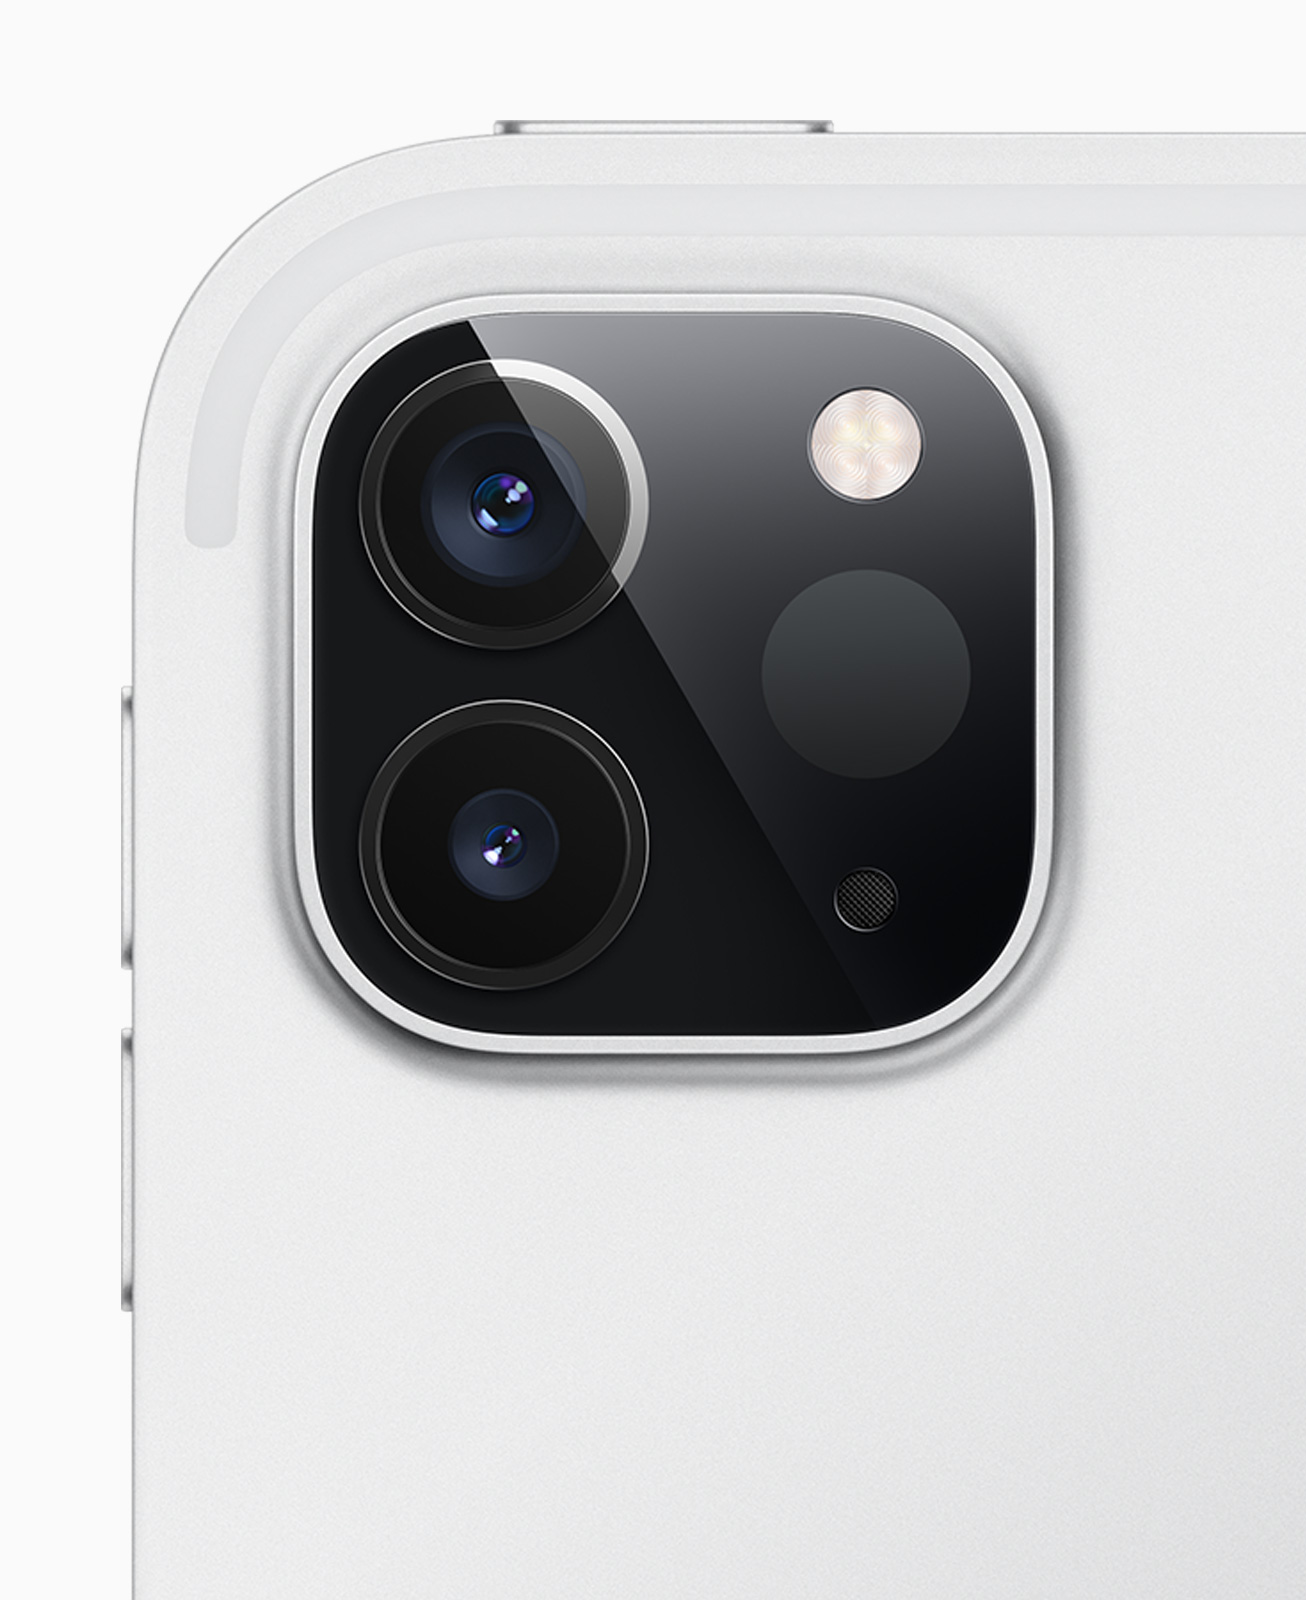 apple nuovo ipad pro 2020 fotocamera